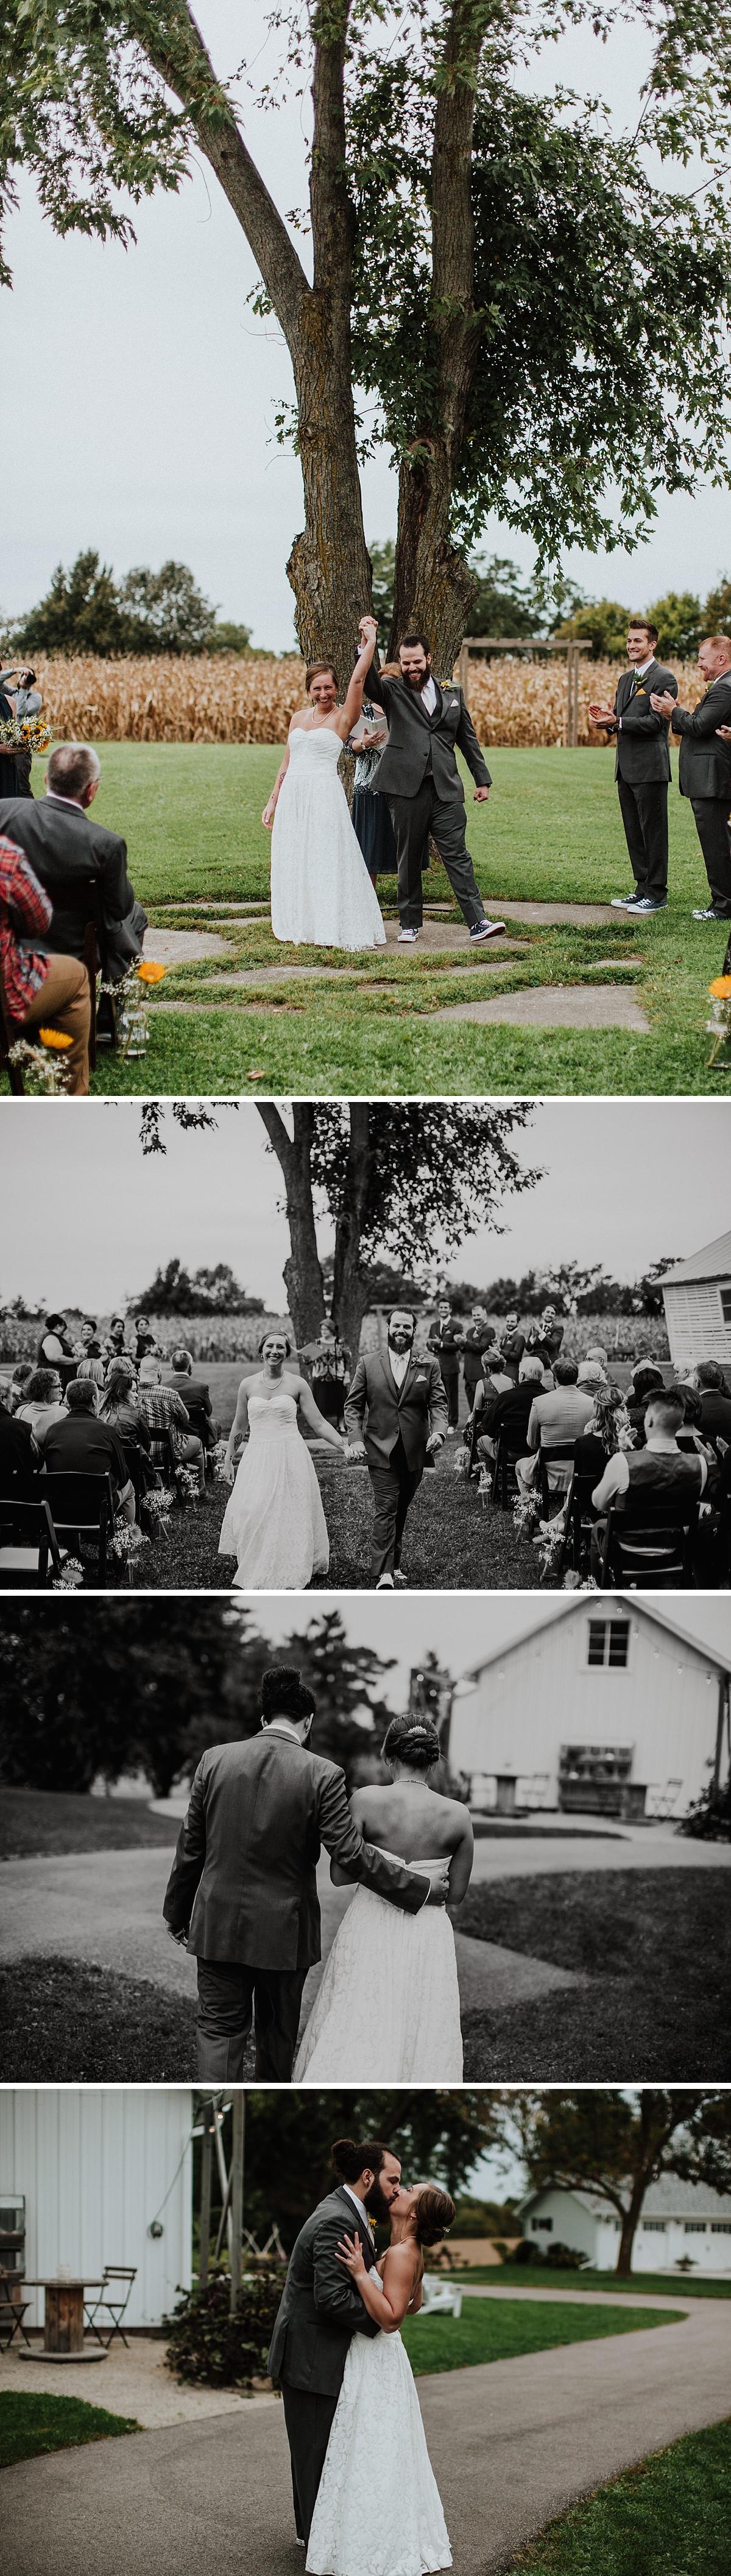 Vintage-Fields-Farmin-Bettys-Wedding_0066.jpg